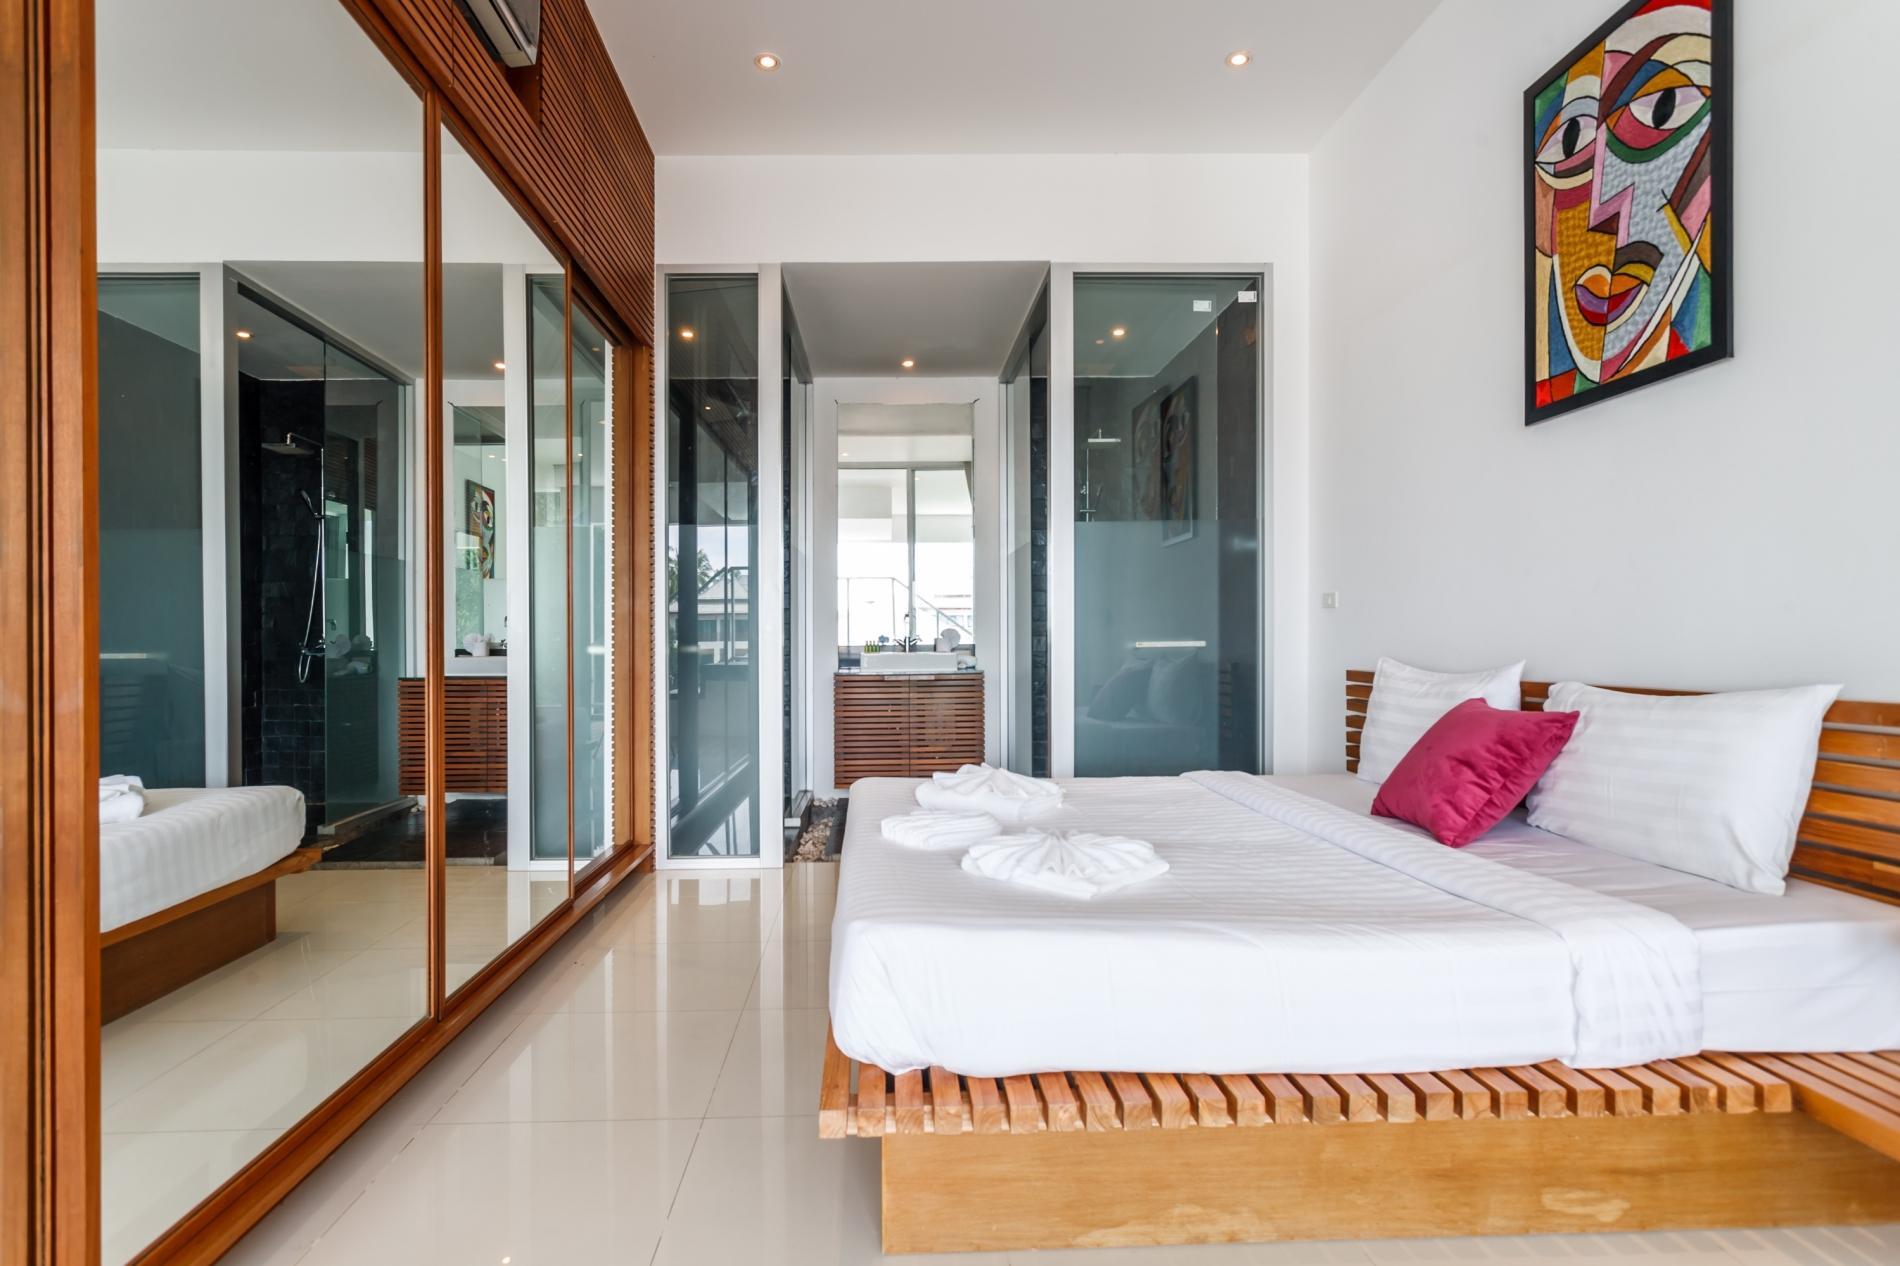 Apartment The Quarter 301 - Luxury Surin 3 bedroom apartment private pool photo 20328282